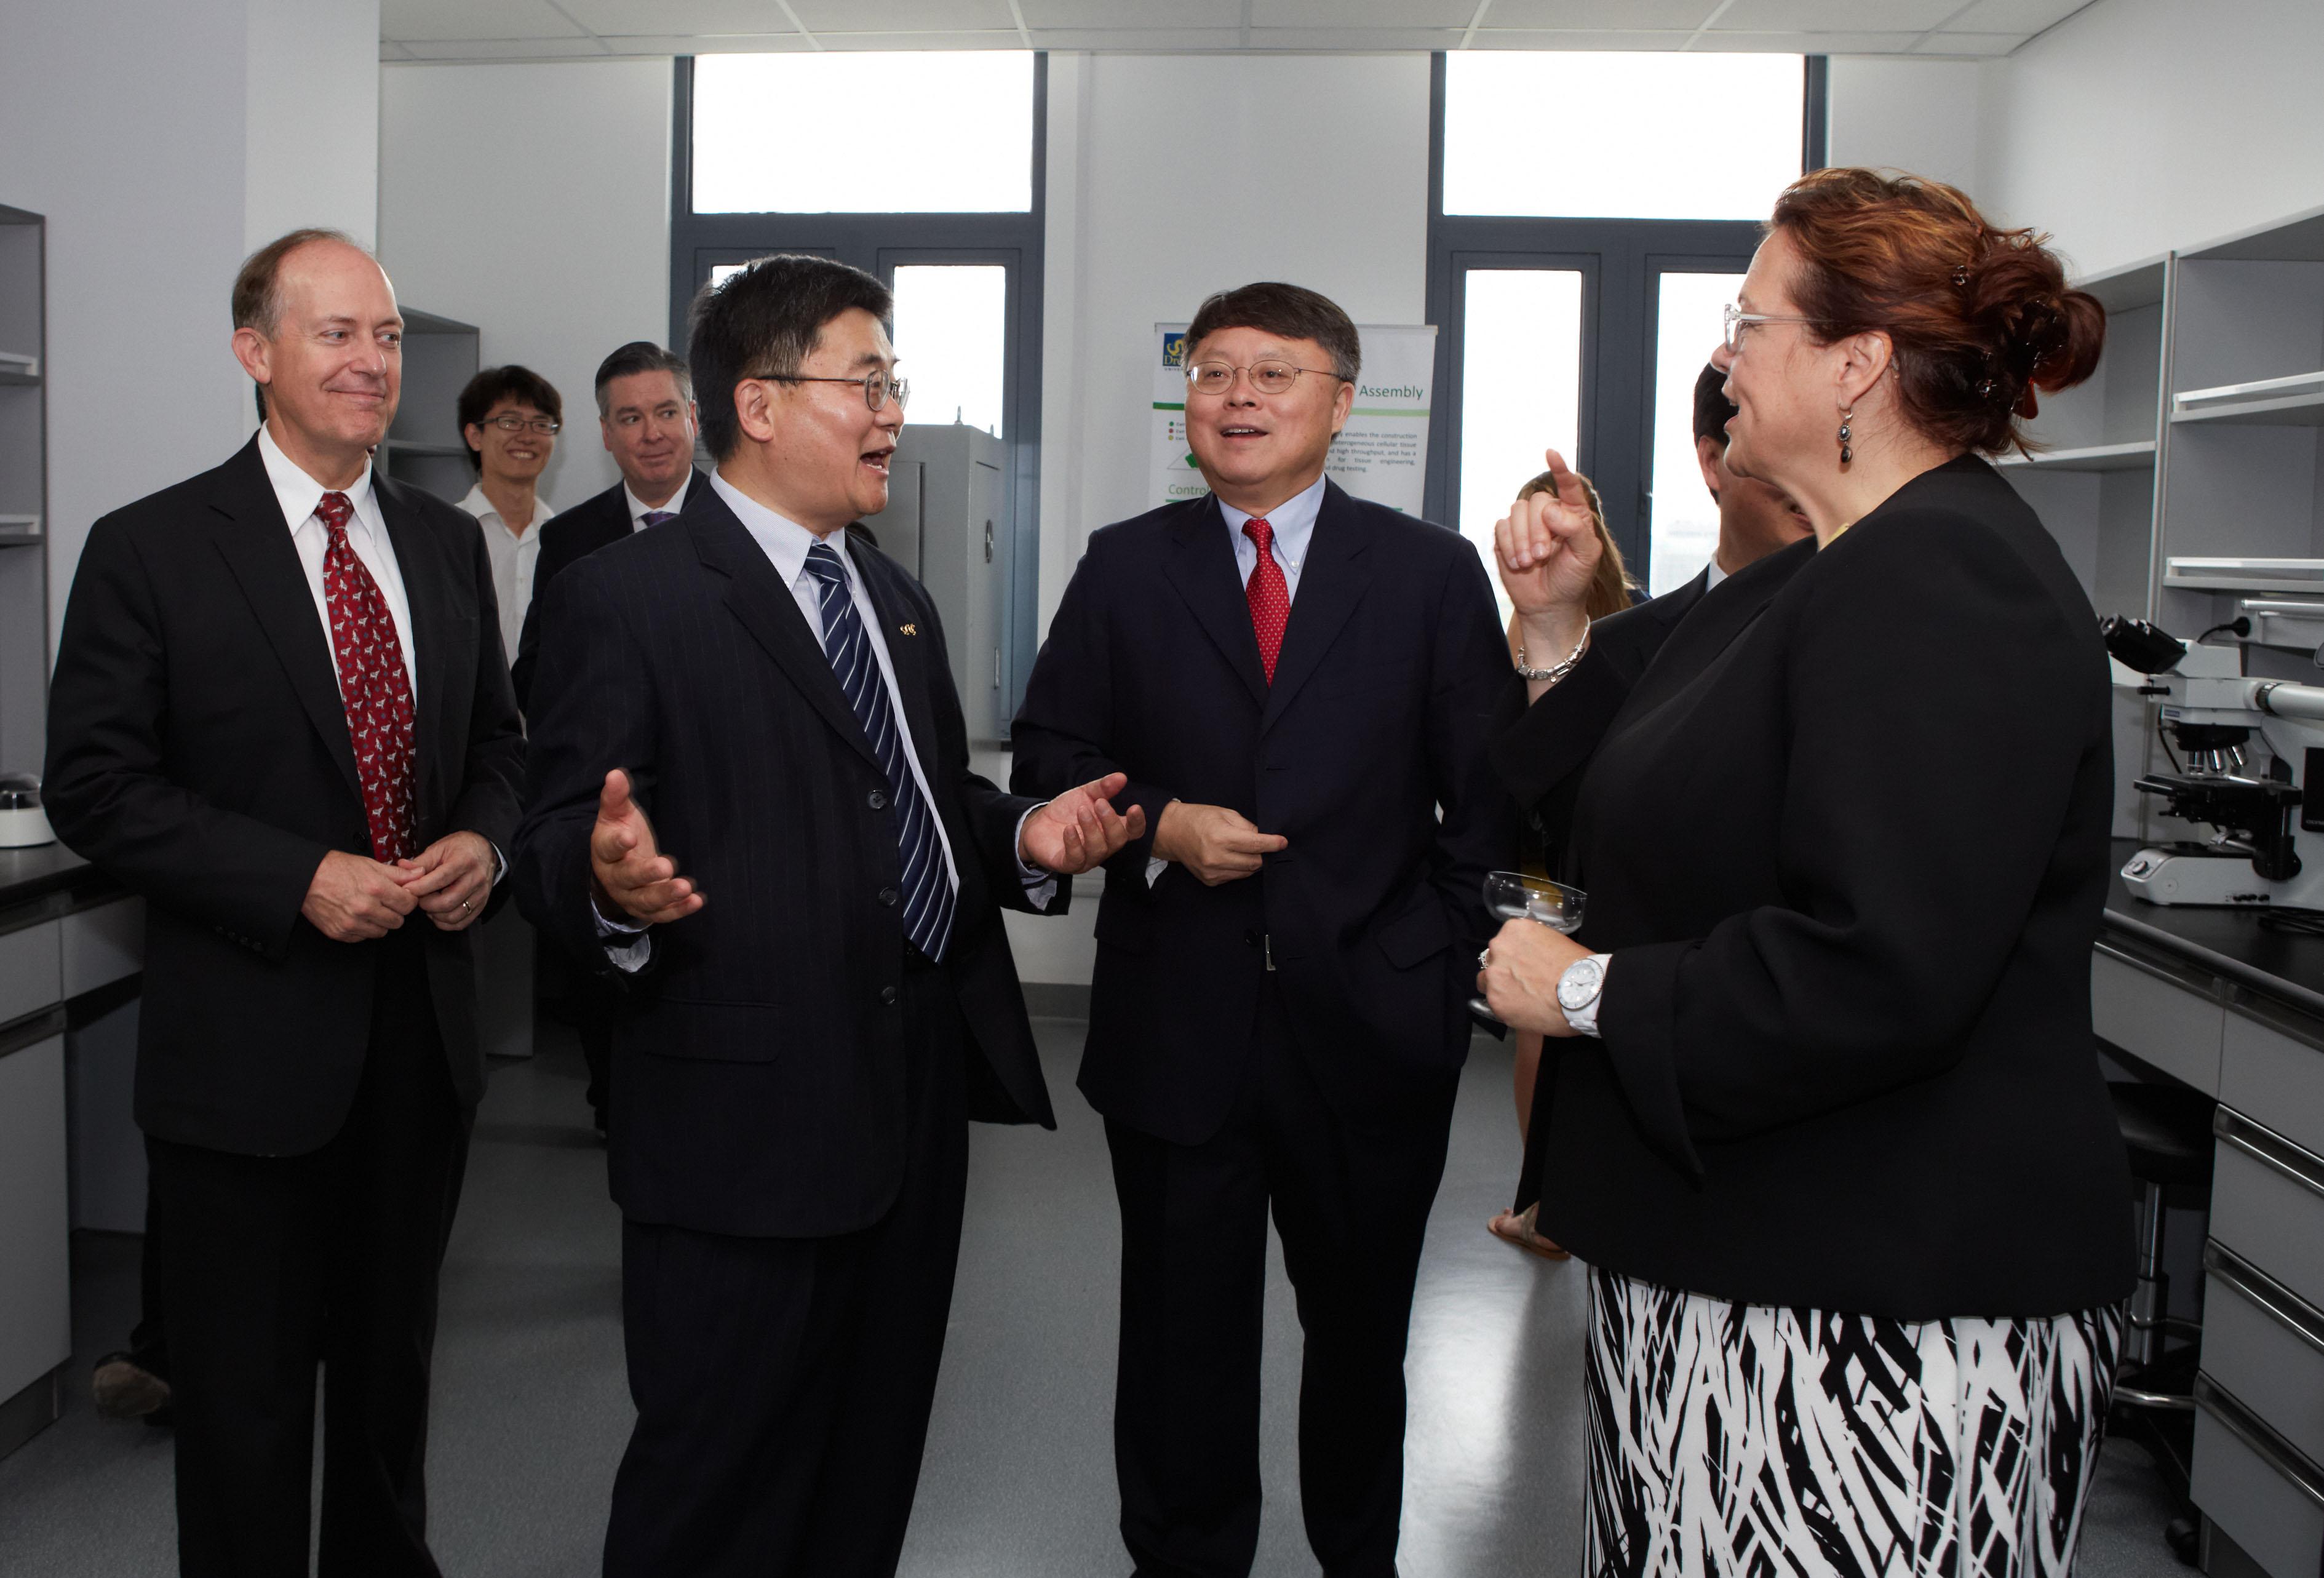 Делегаты Дрекселя и Президент Академии Наук Китая Цзян Мъянхенг Dr. Jiang Mianheng